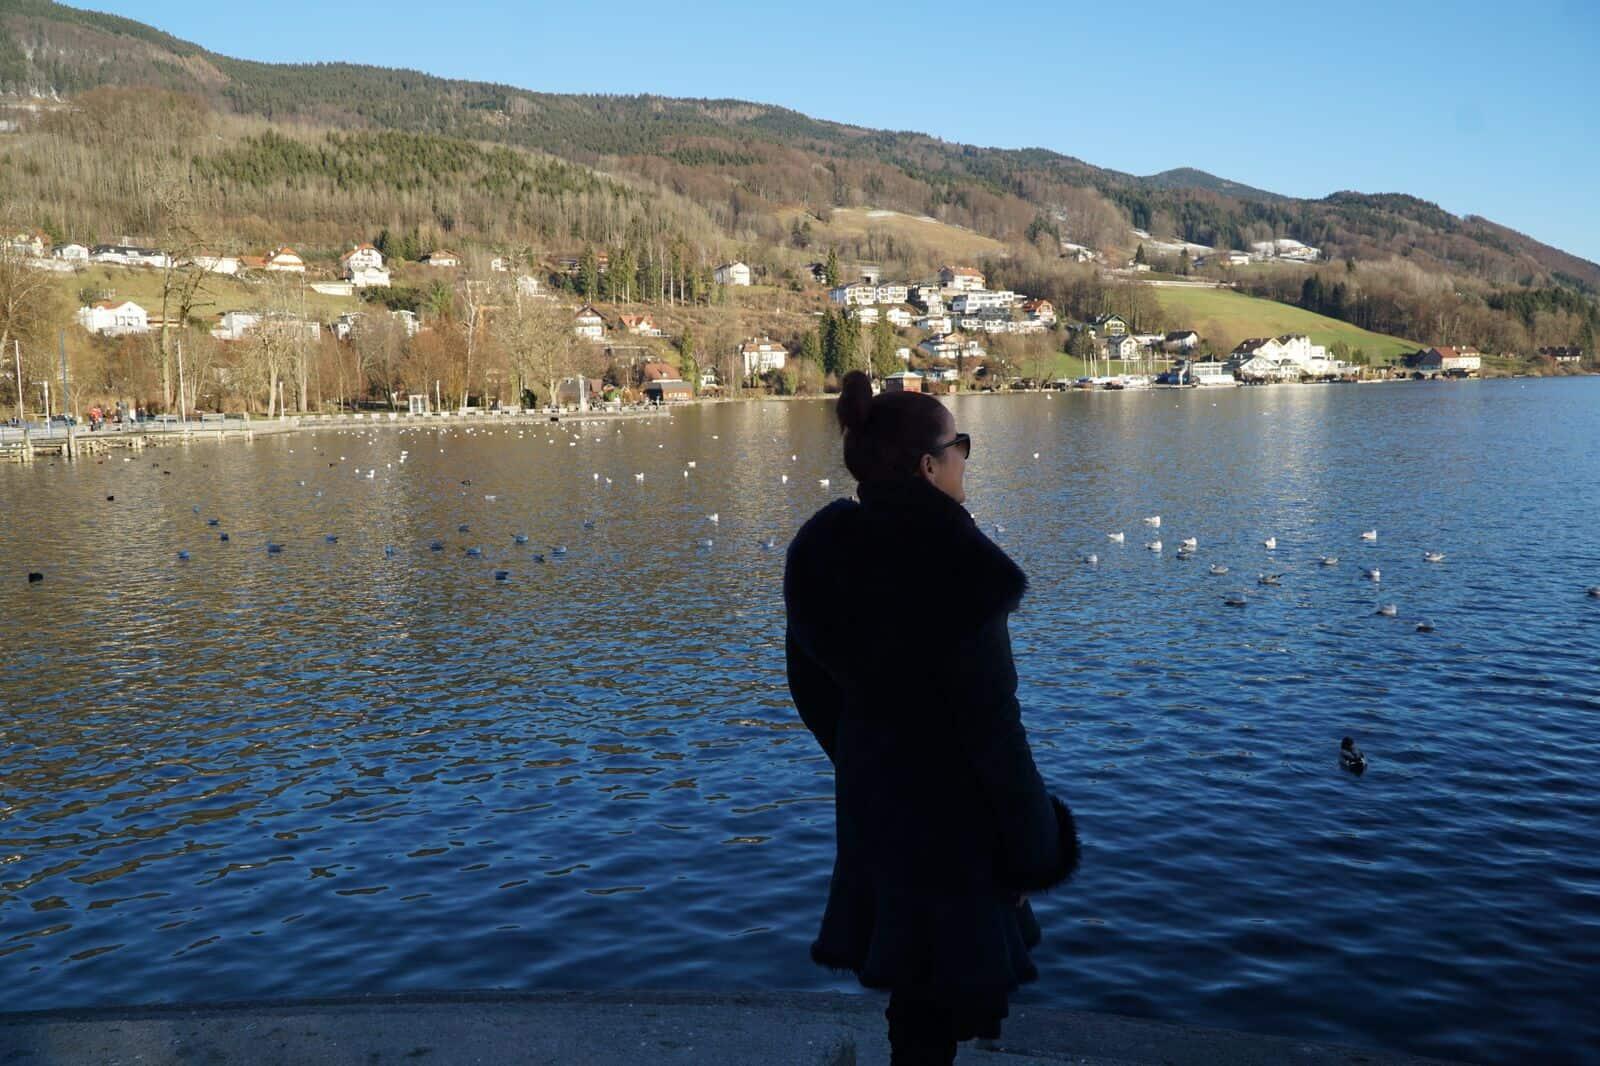 Dreamsinheels-Mondsee-Austria